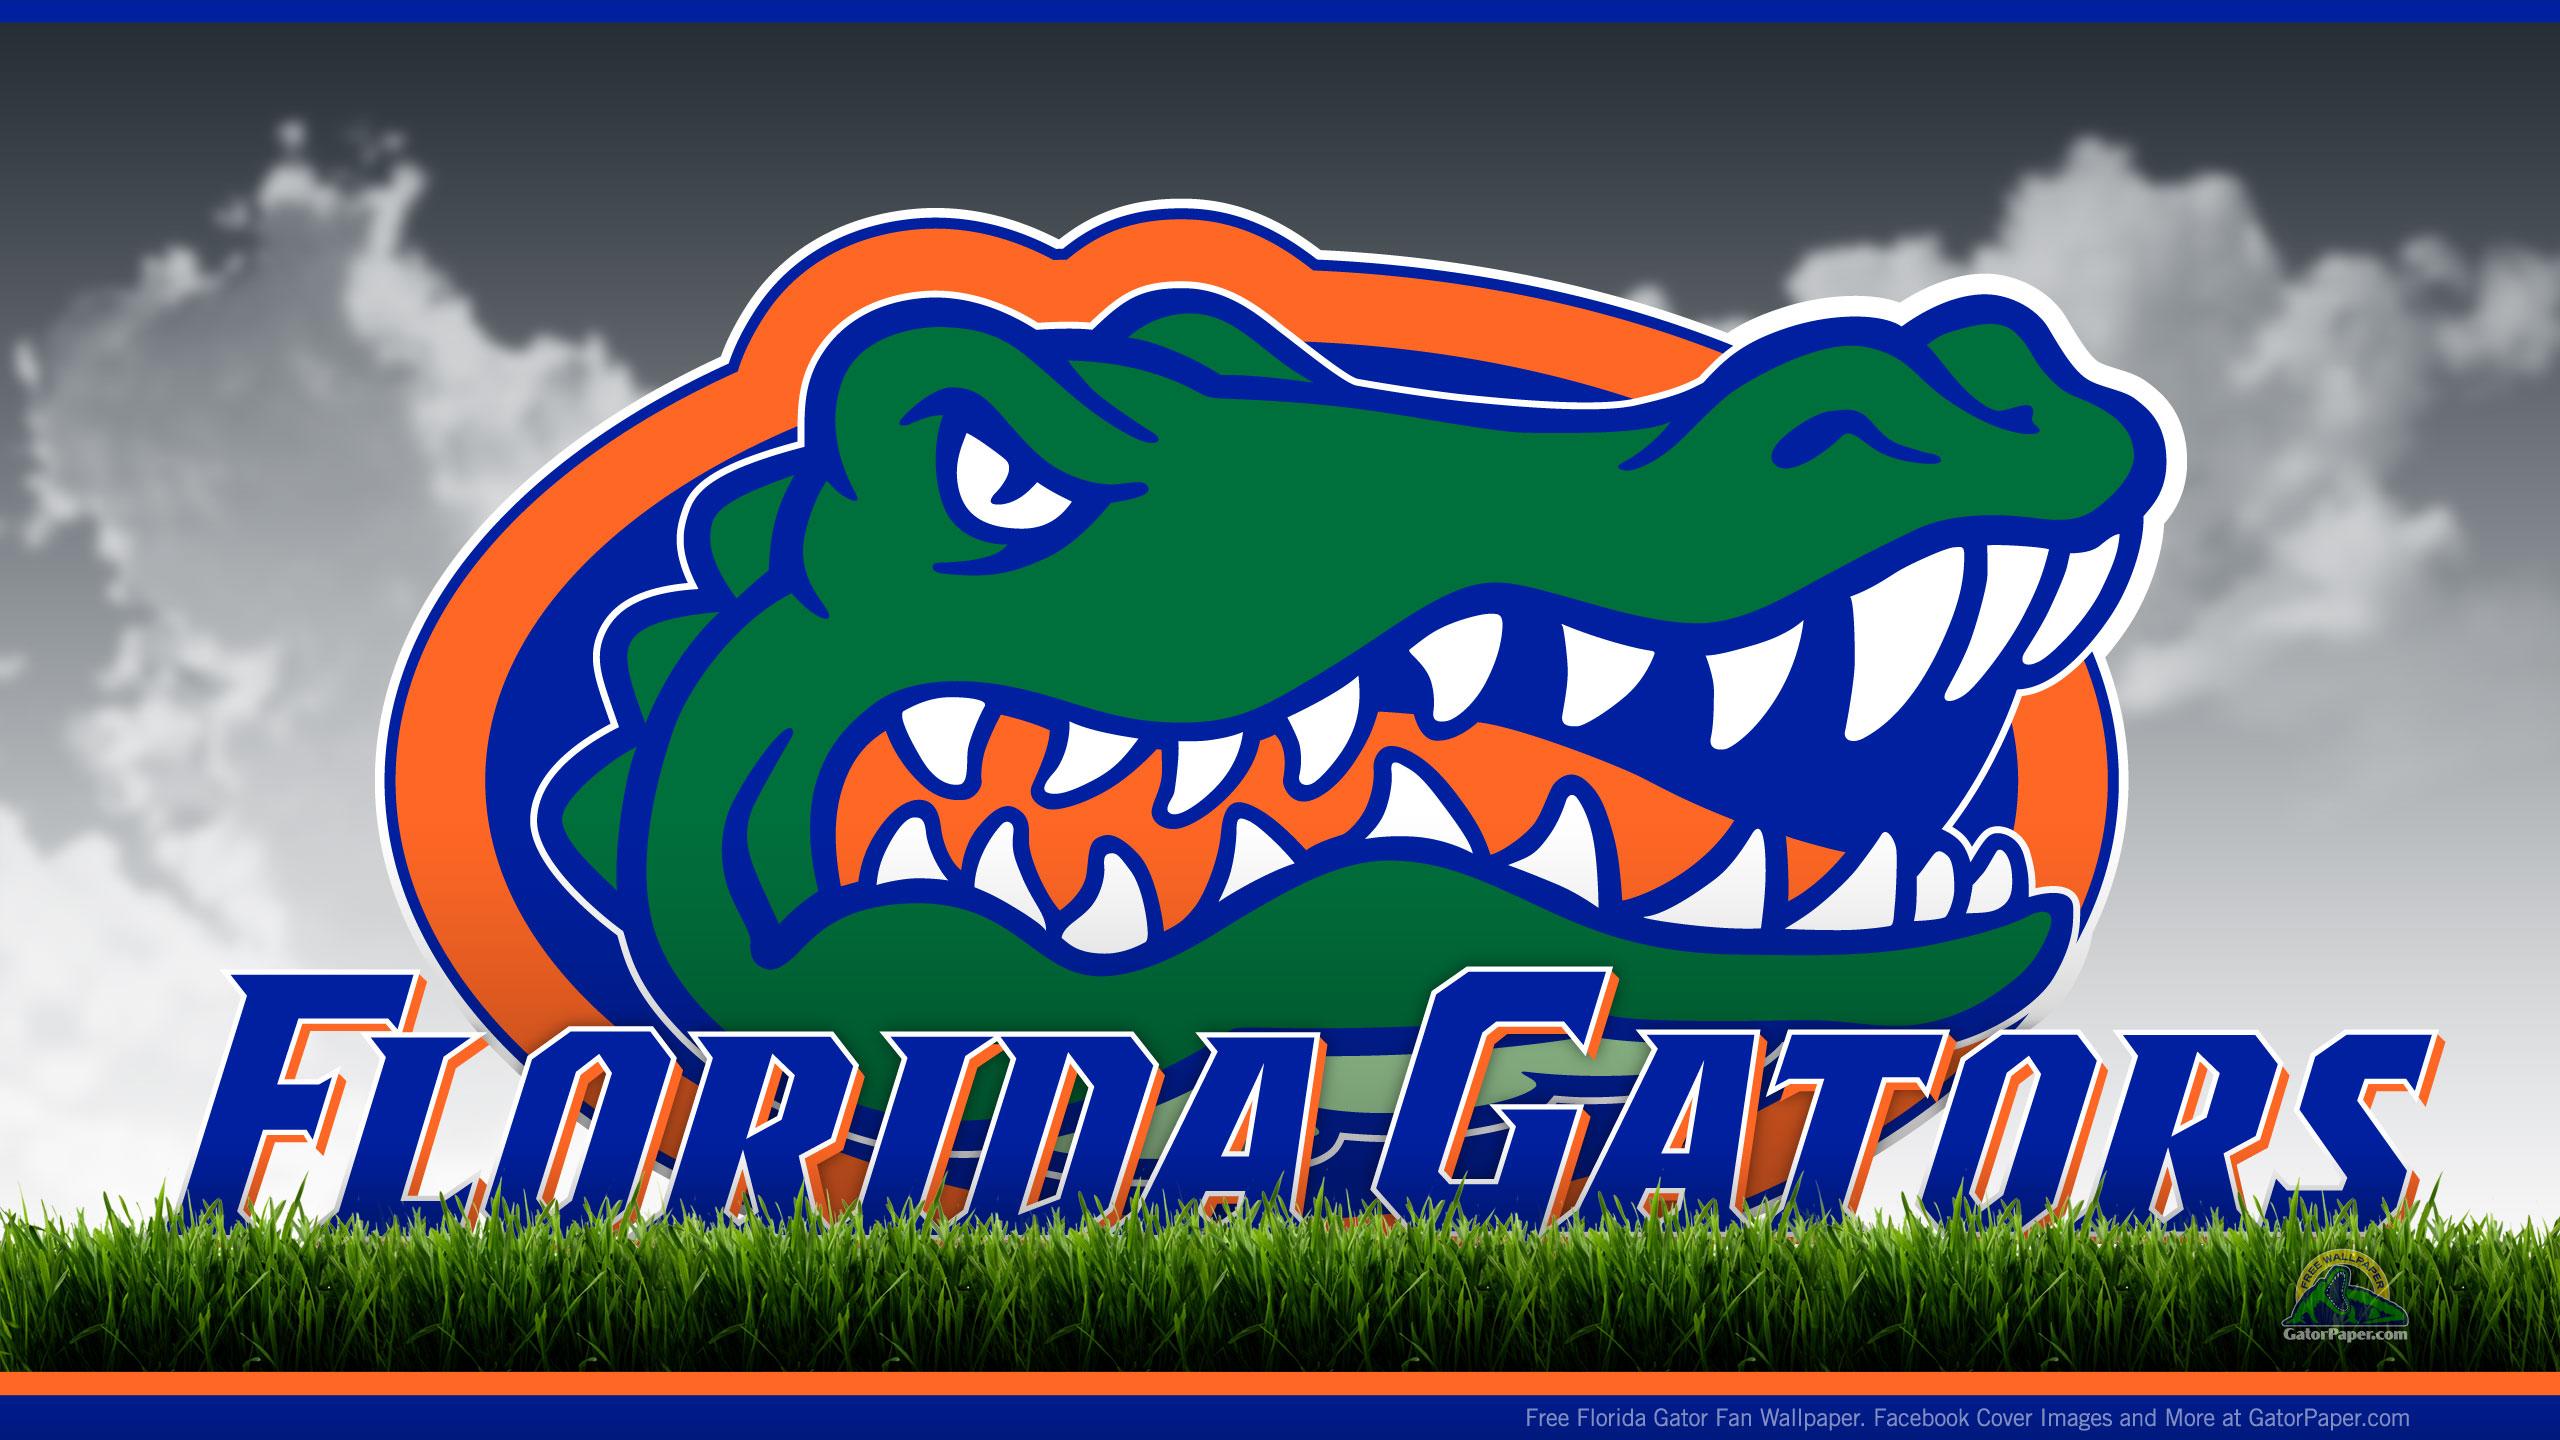 POLICE: Florida Gators Linebacker Helped Stop Rape Outside Gainesville Bar